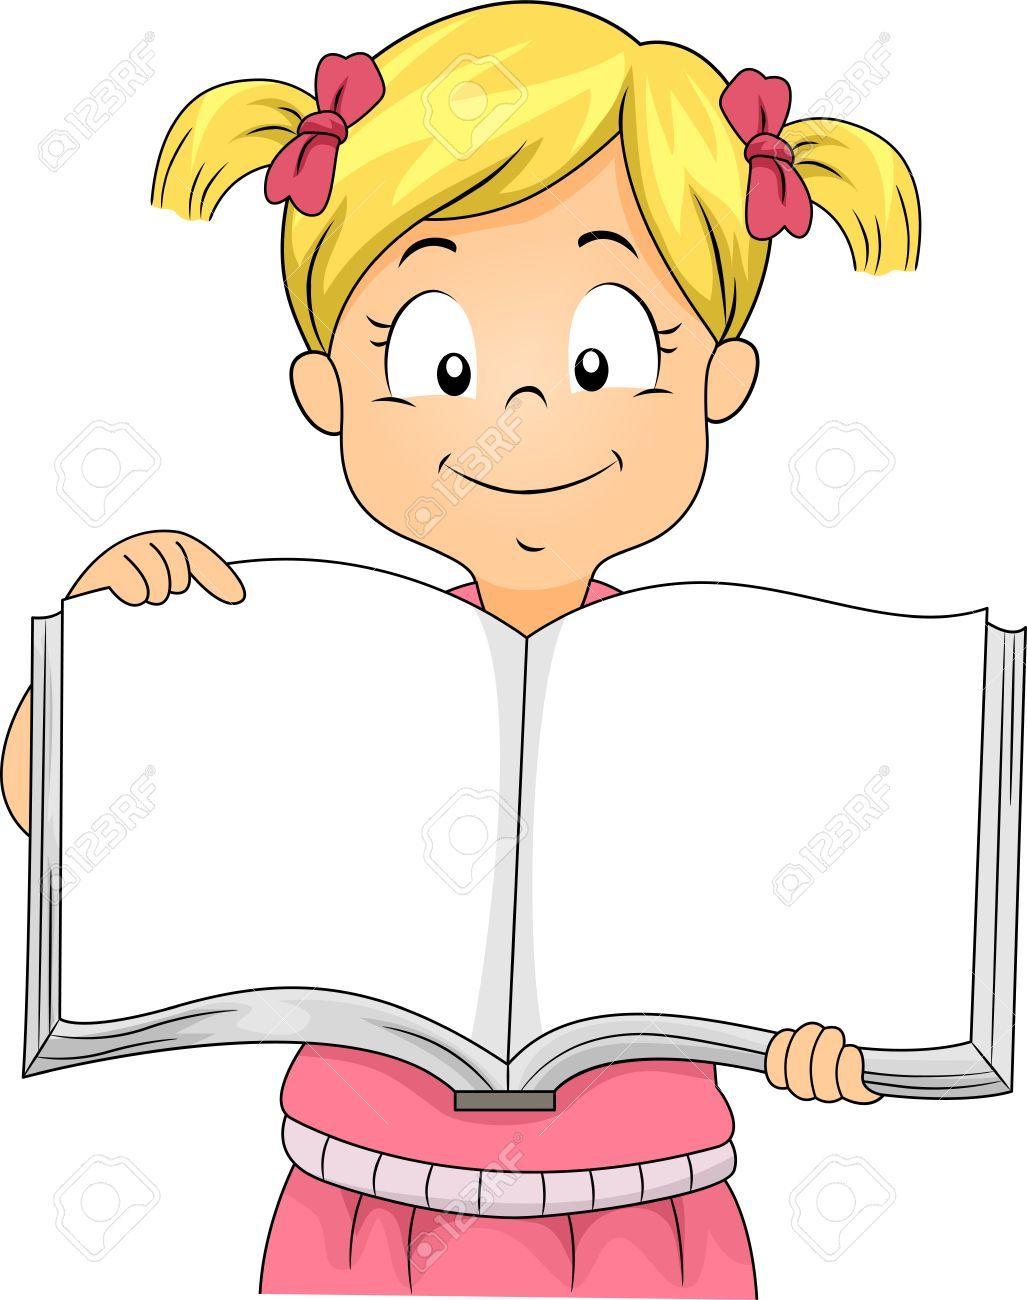 Open your book clipart 5 » Clipart Portal.